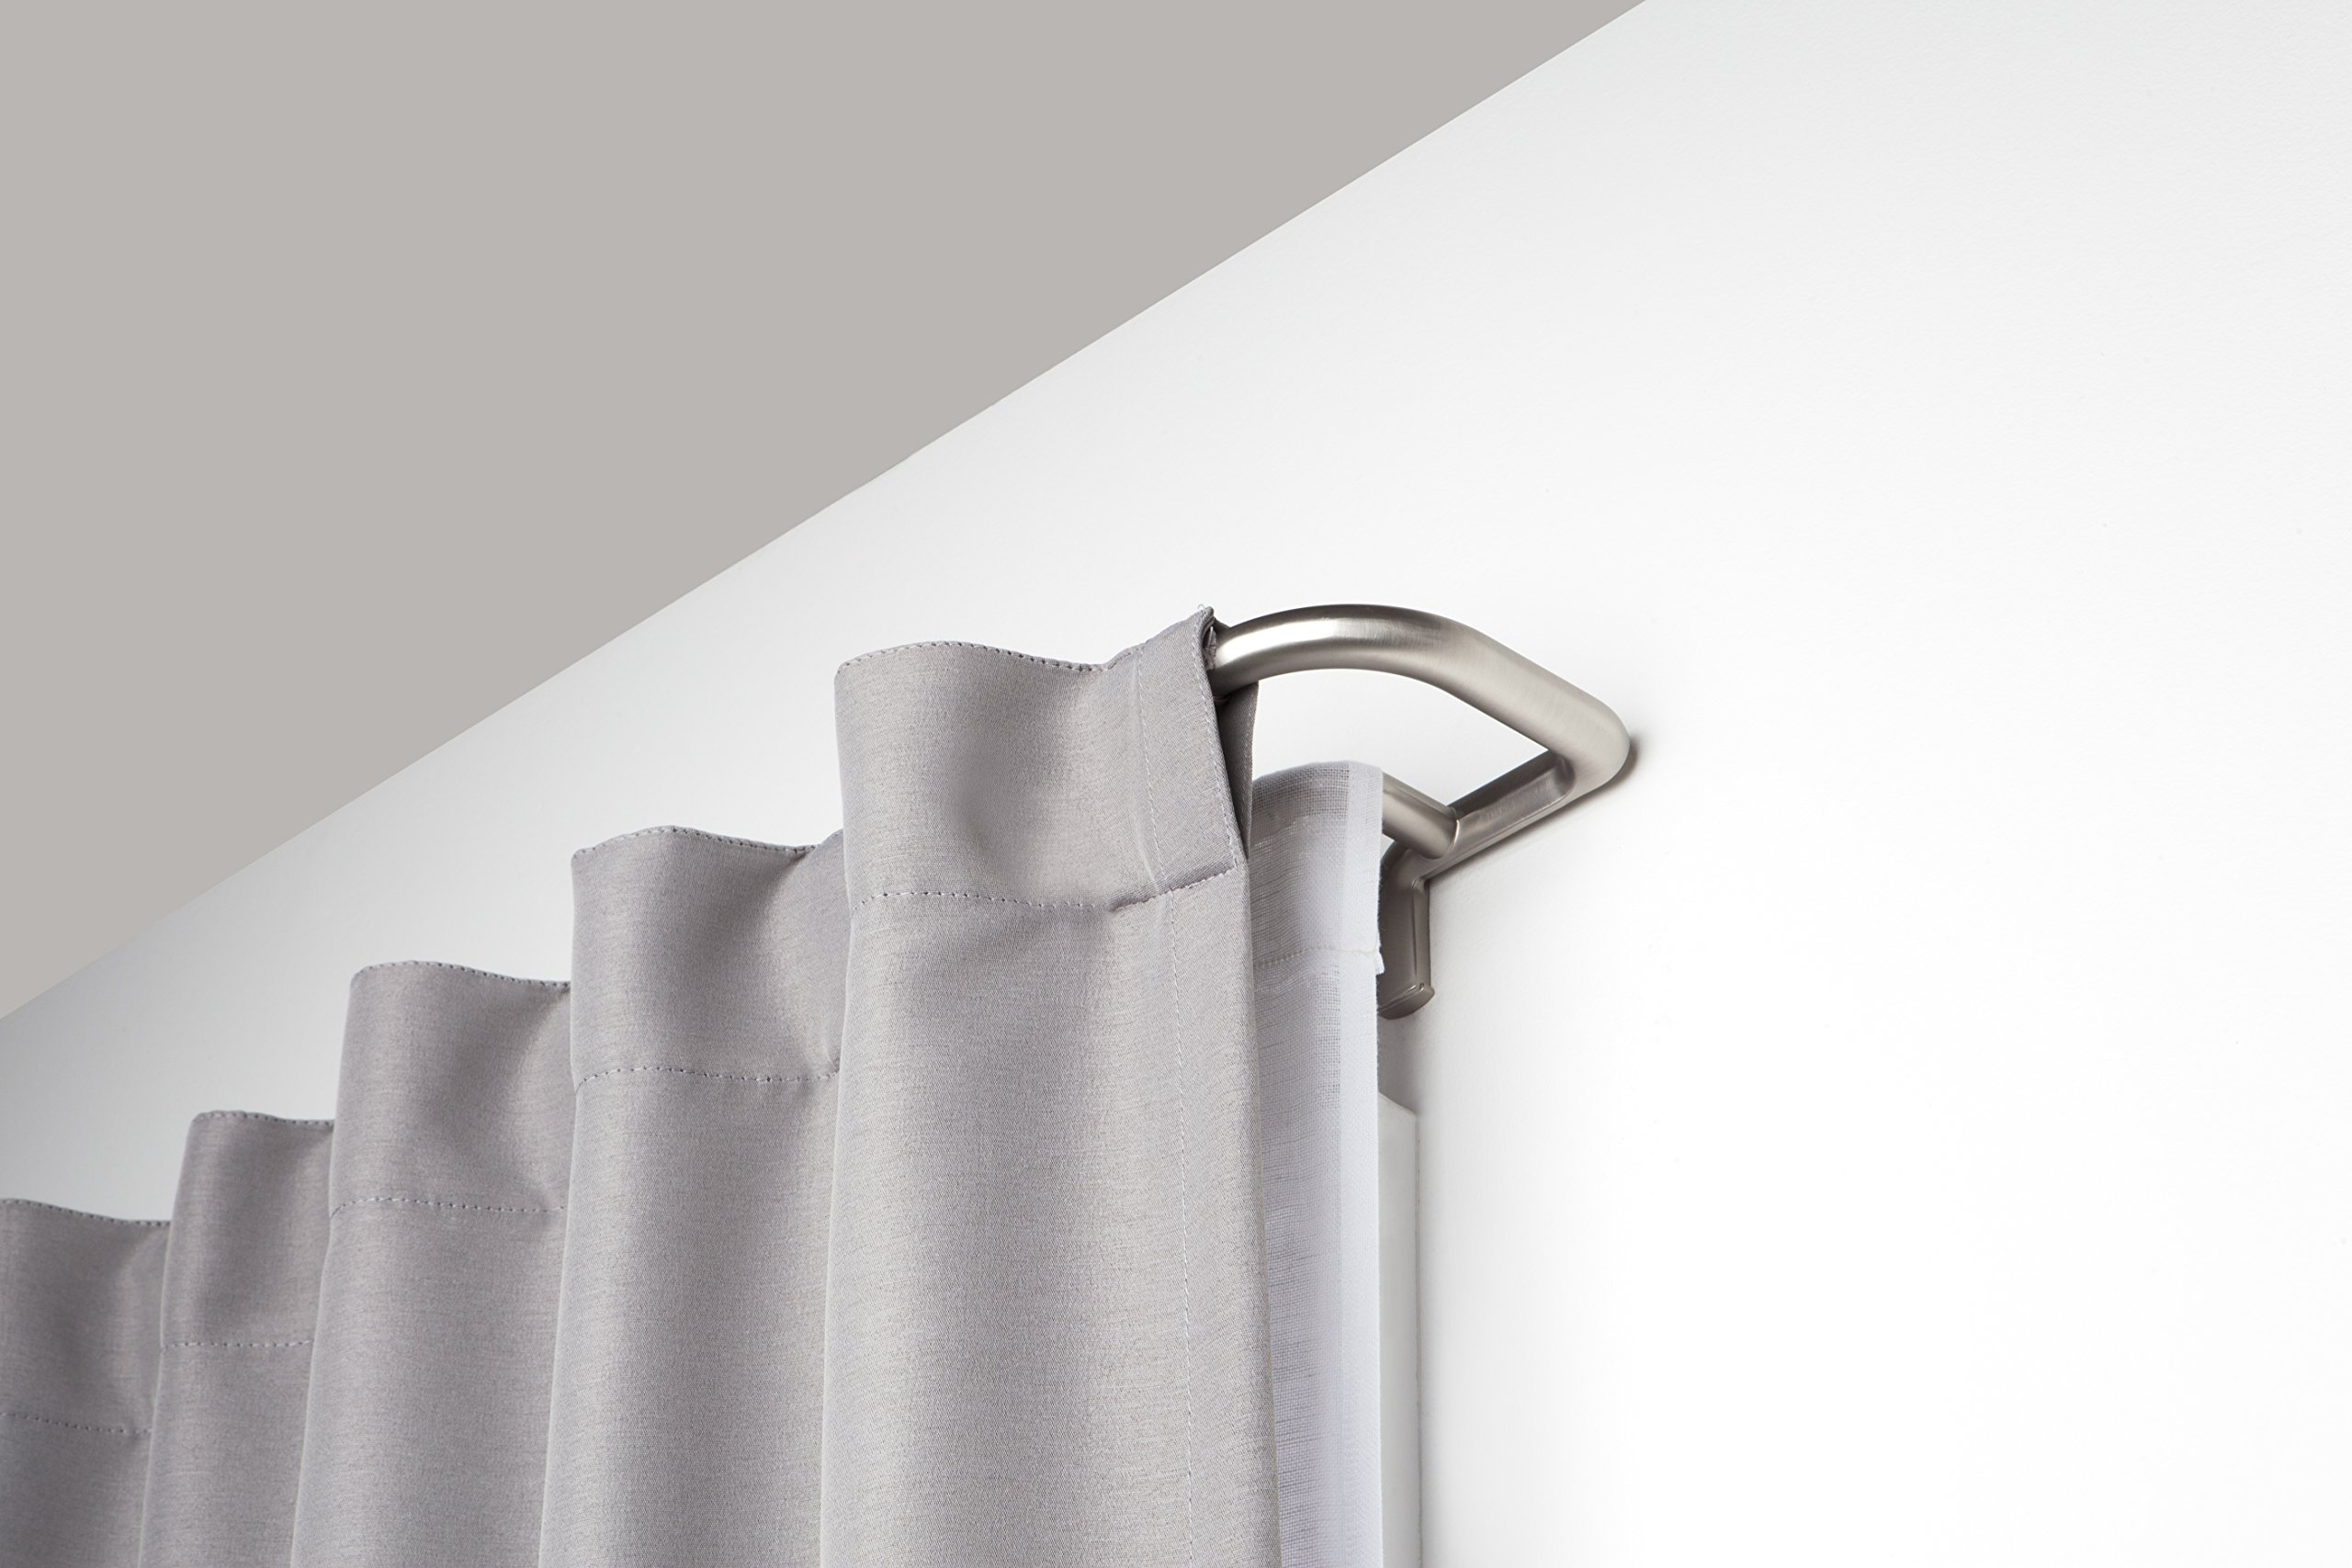 Umbra Curtain Rod Installation Instructions Curtain